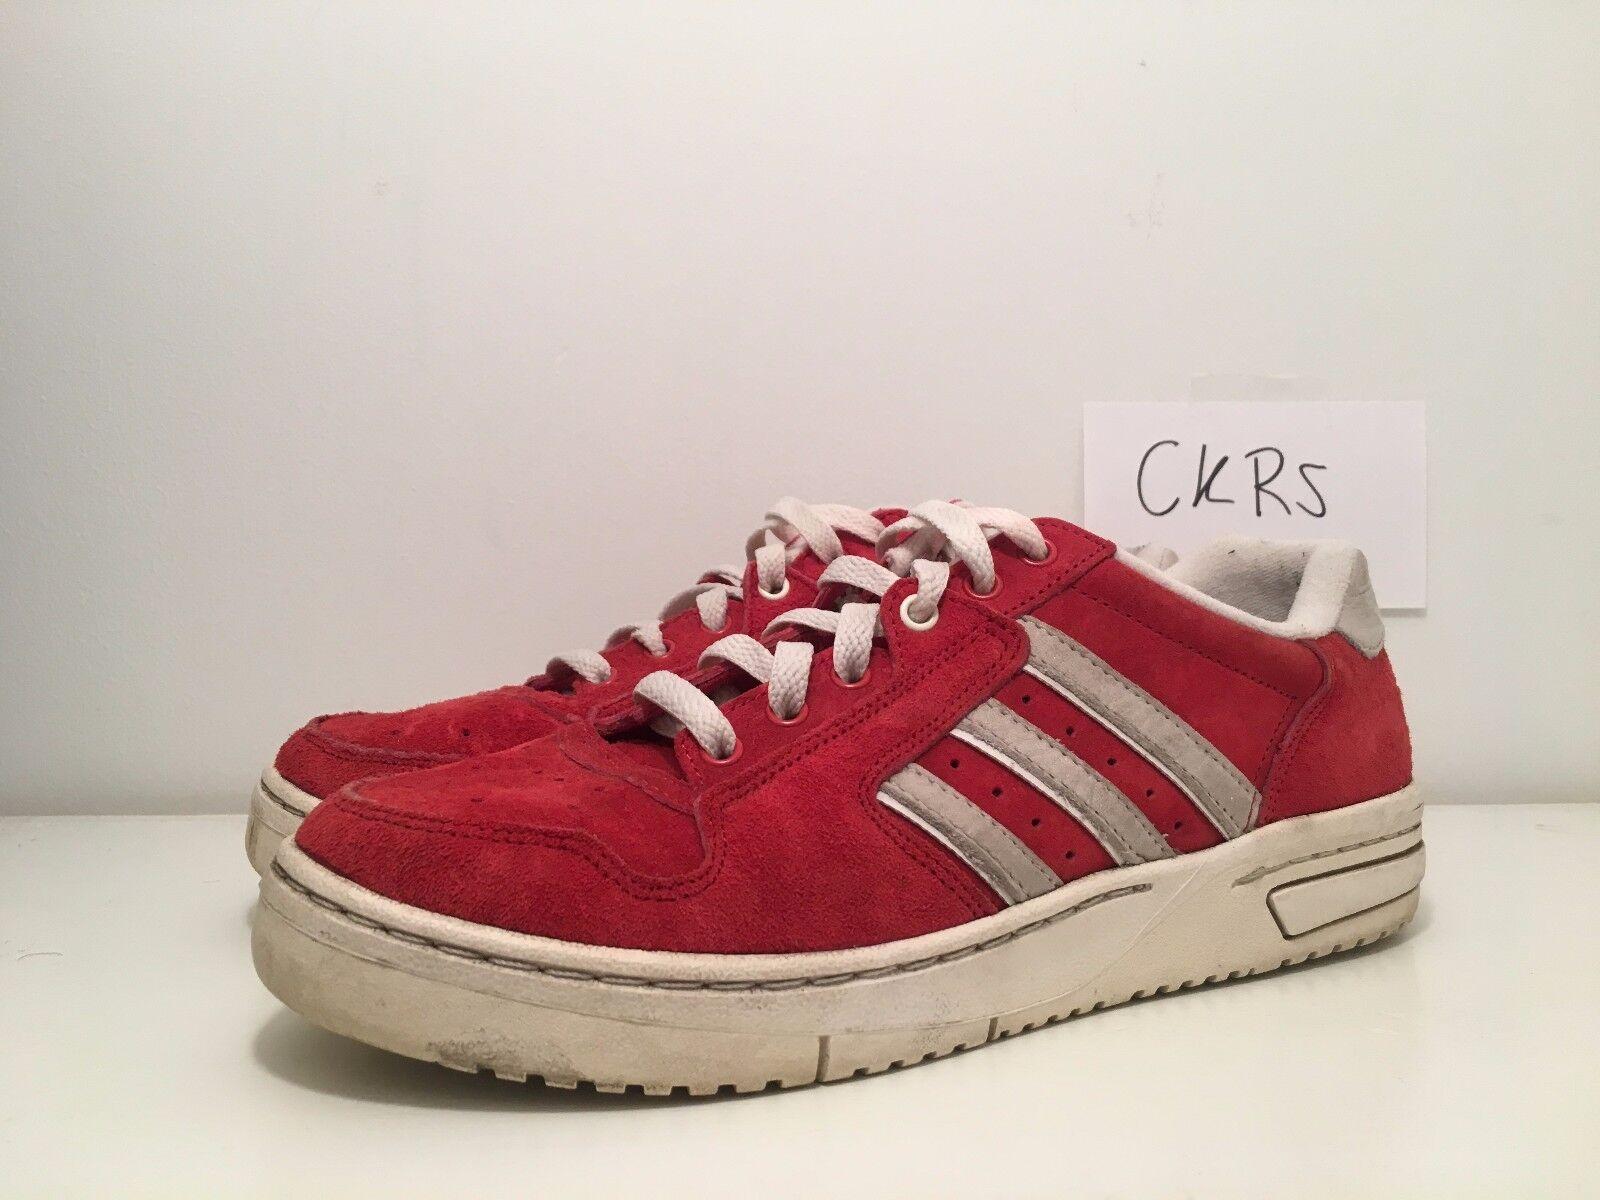 Foot Patrol x Adidas Edberg 86